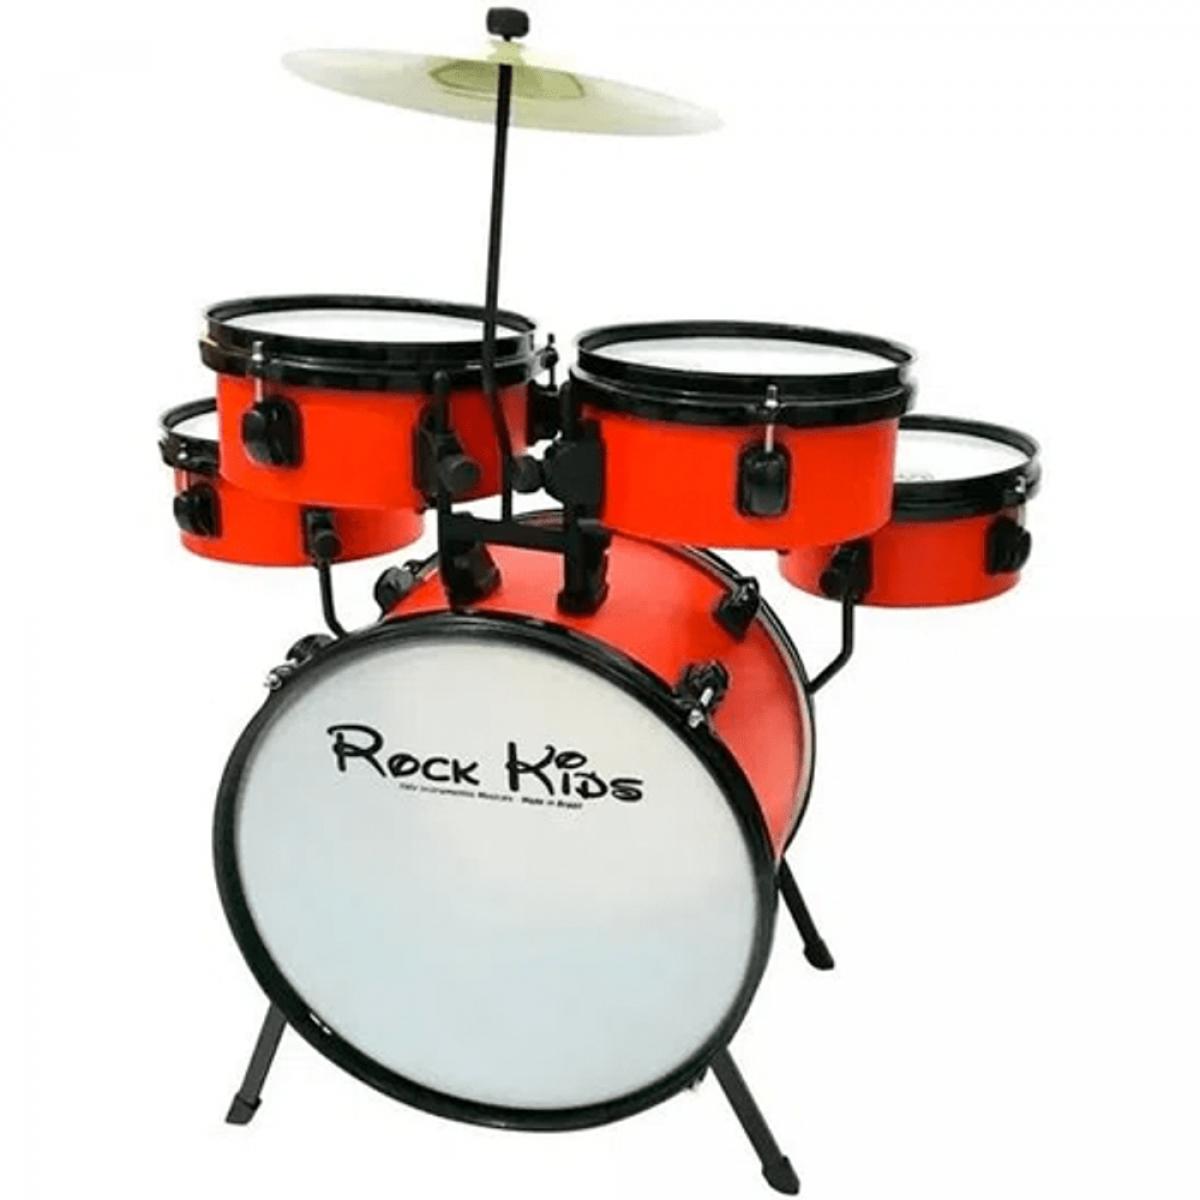 Bateria Infantil RMV Rock Kids PBKD14020 Vermelha